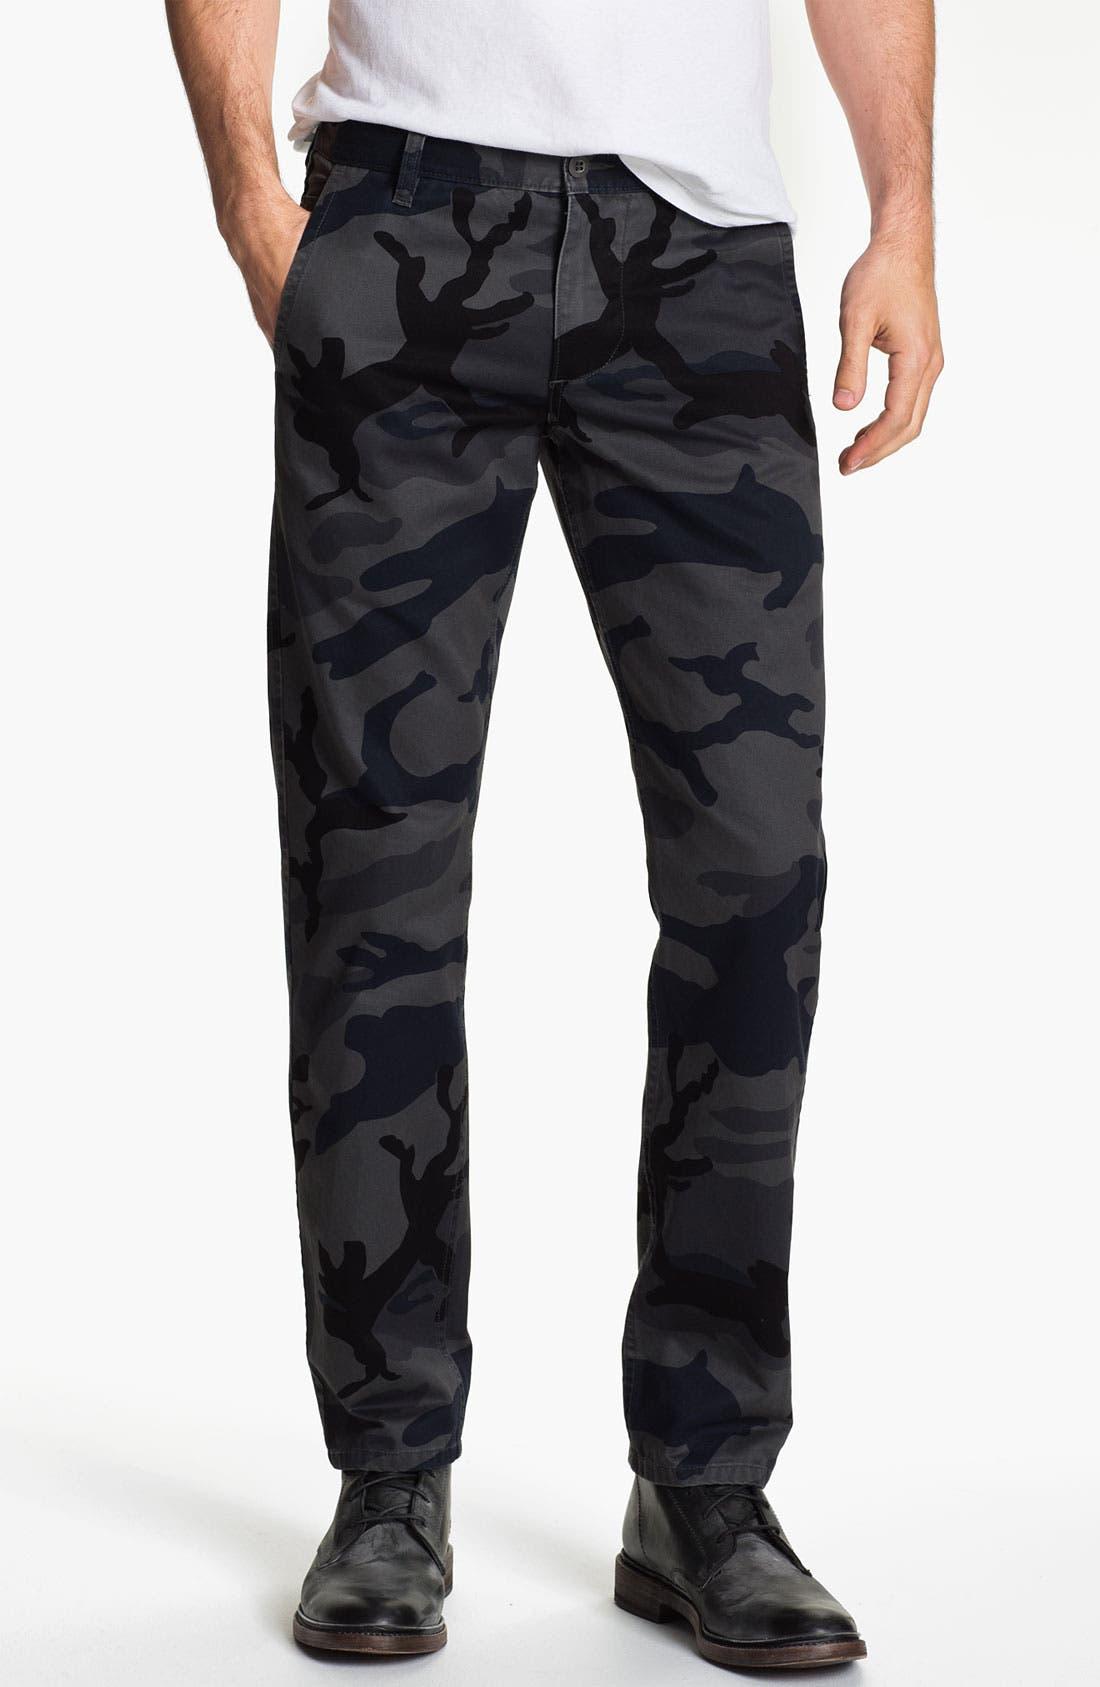 DOCKERS<SUP>®</SUP> 'Alpha Khaki' Slim Straight Leg Chinos, Main, color, 080